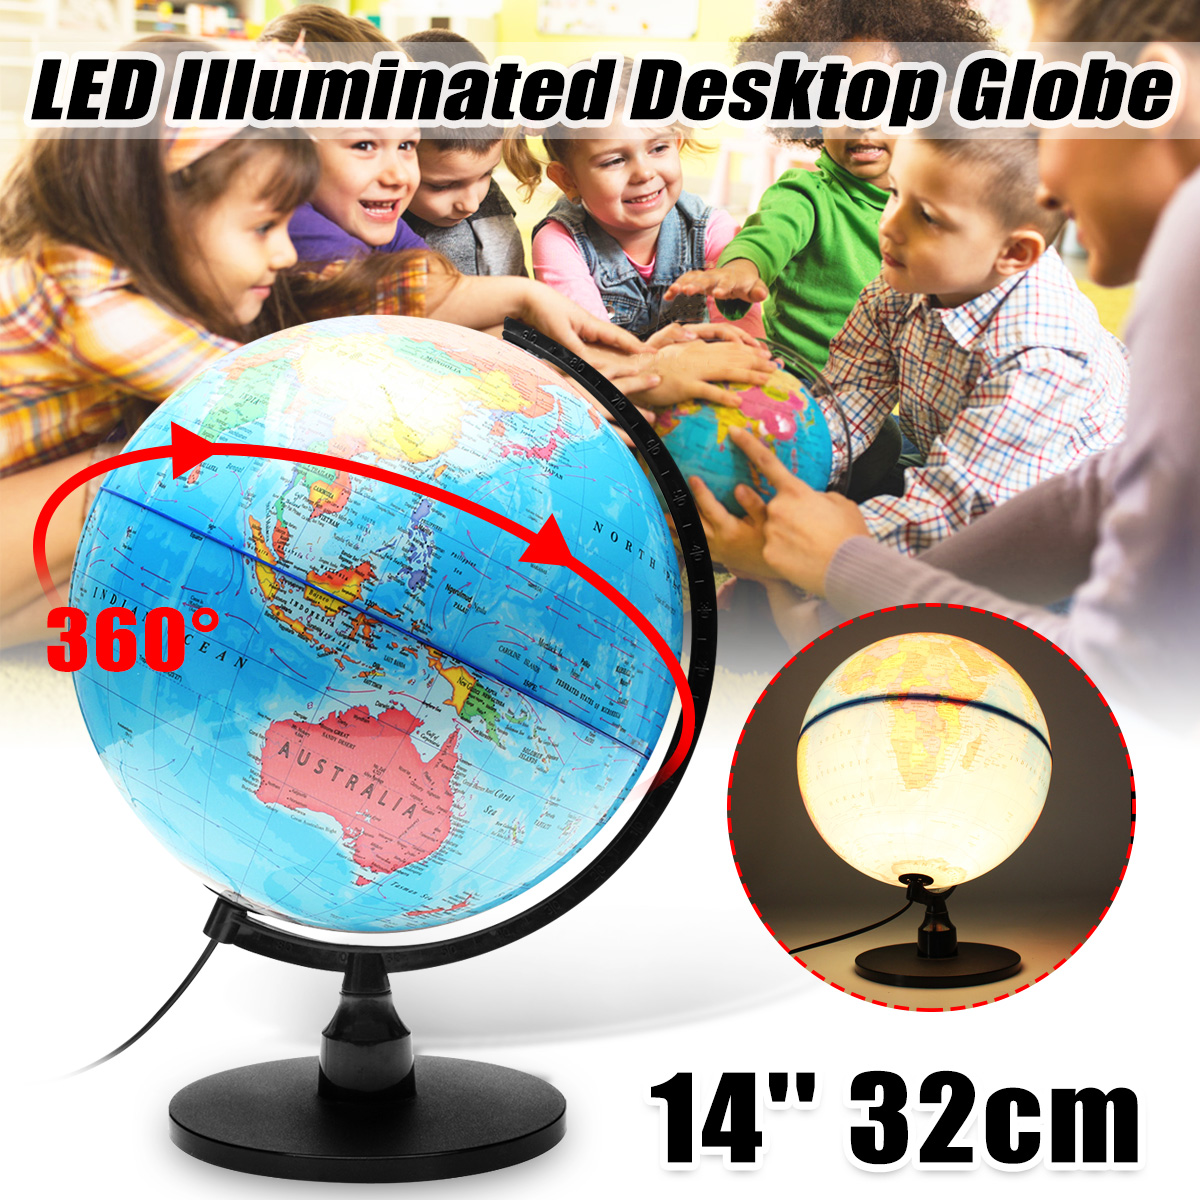 32cm World Earth Globe Map Geography Educational Toys 110V LED Illuminated Tellurion Light Home Office Decor Miniatures